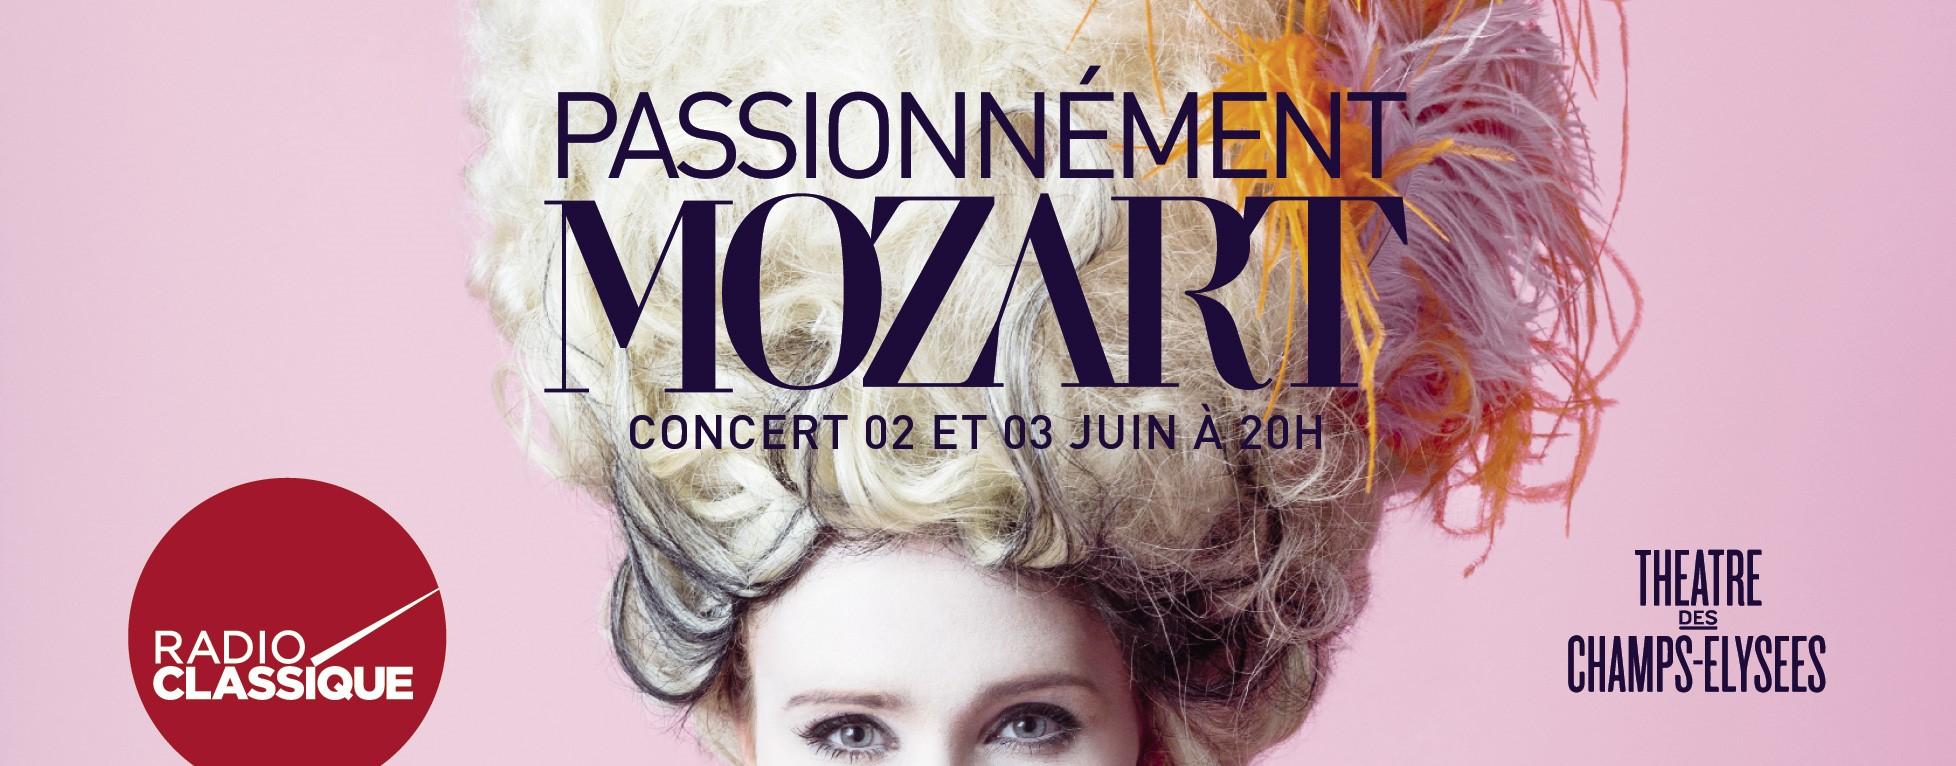 "Radio Classique : un concert ""Passionnément Mozart"""